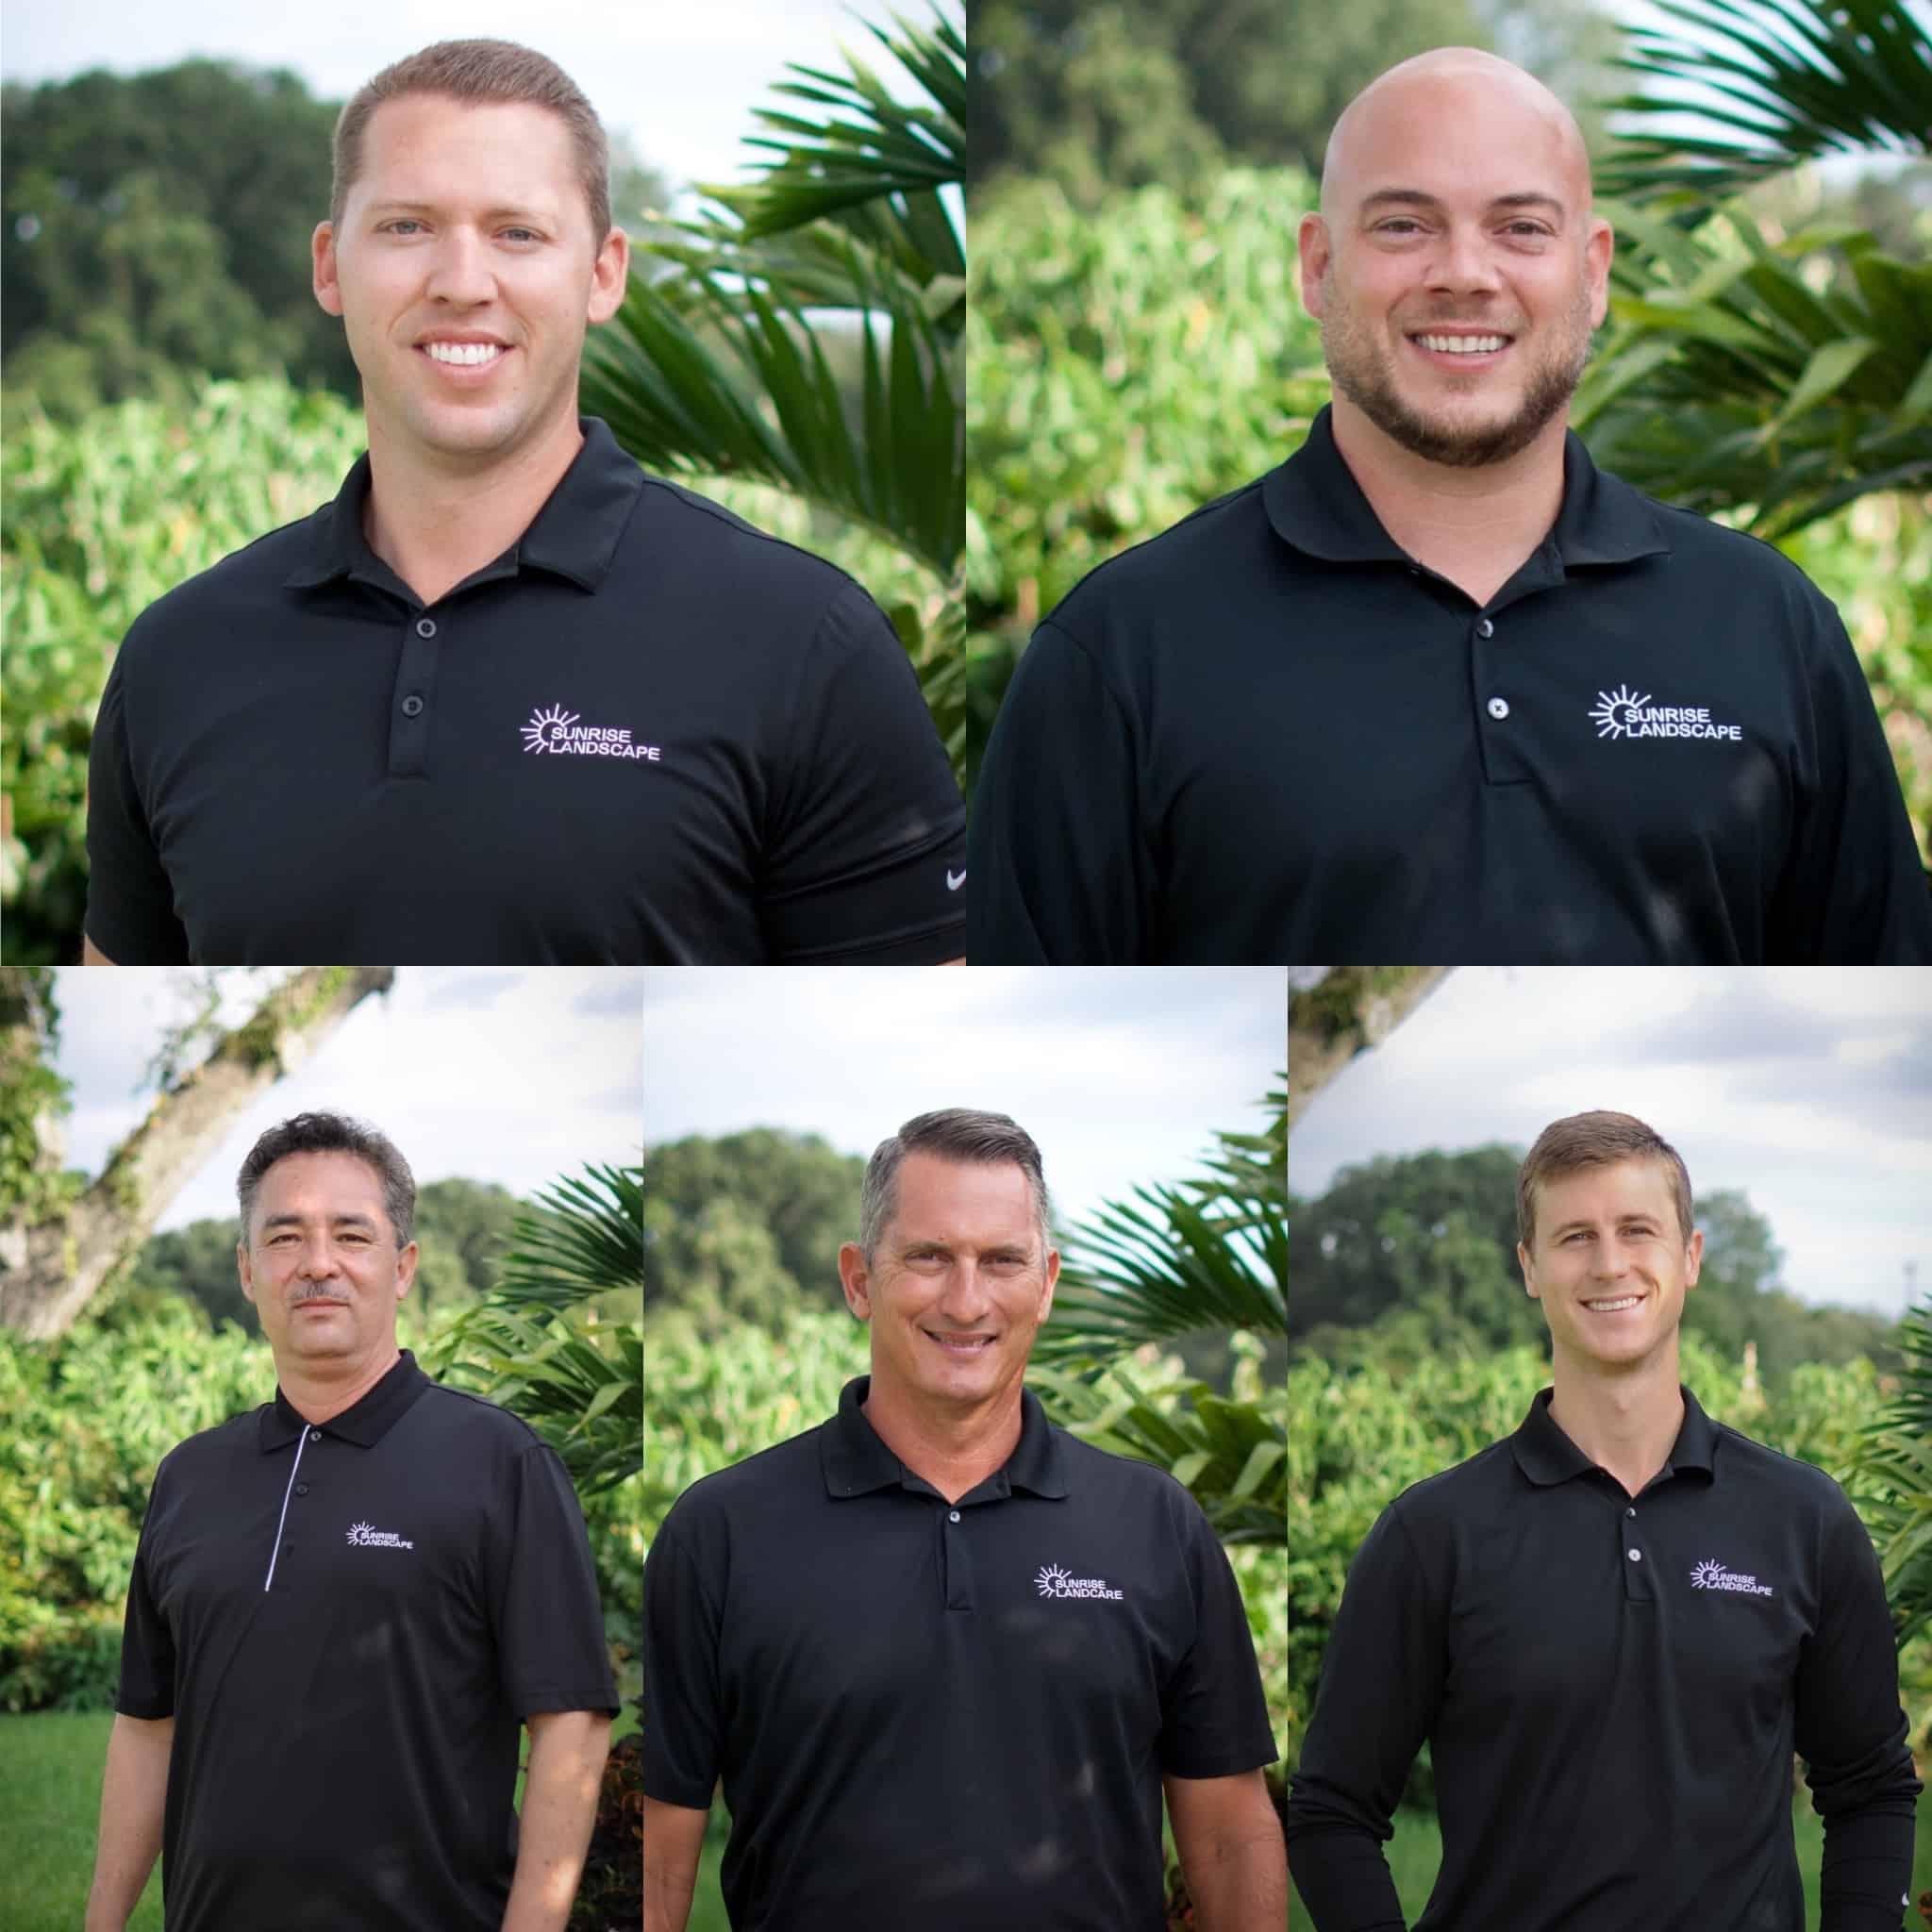 Sunrise Landscape employees in company attire